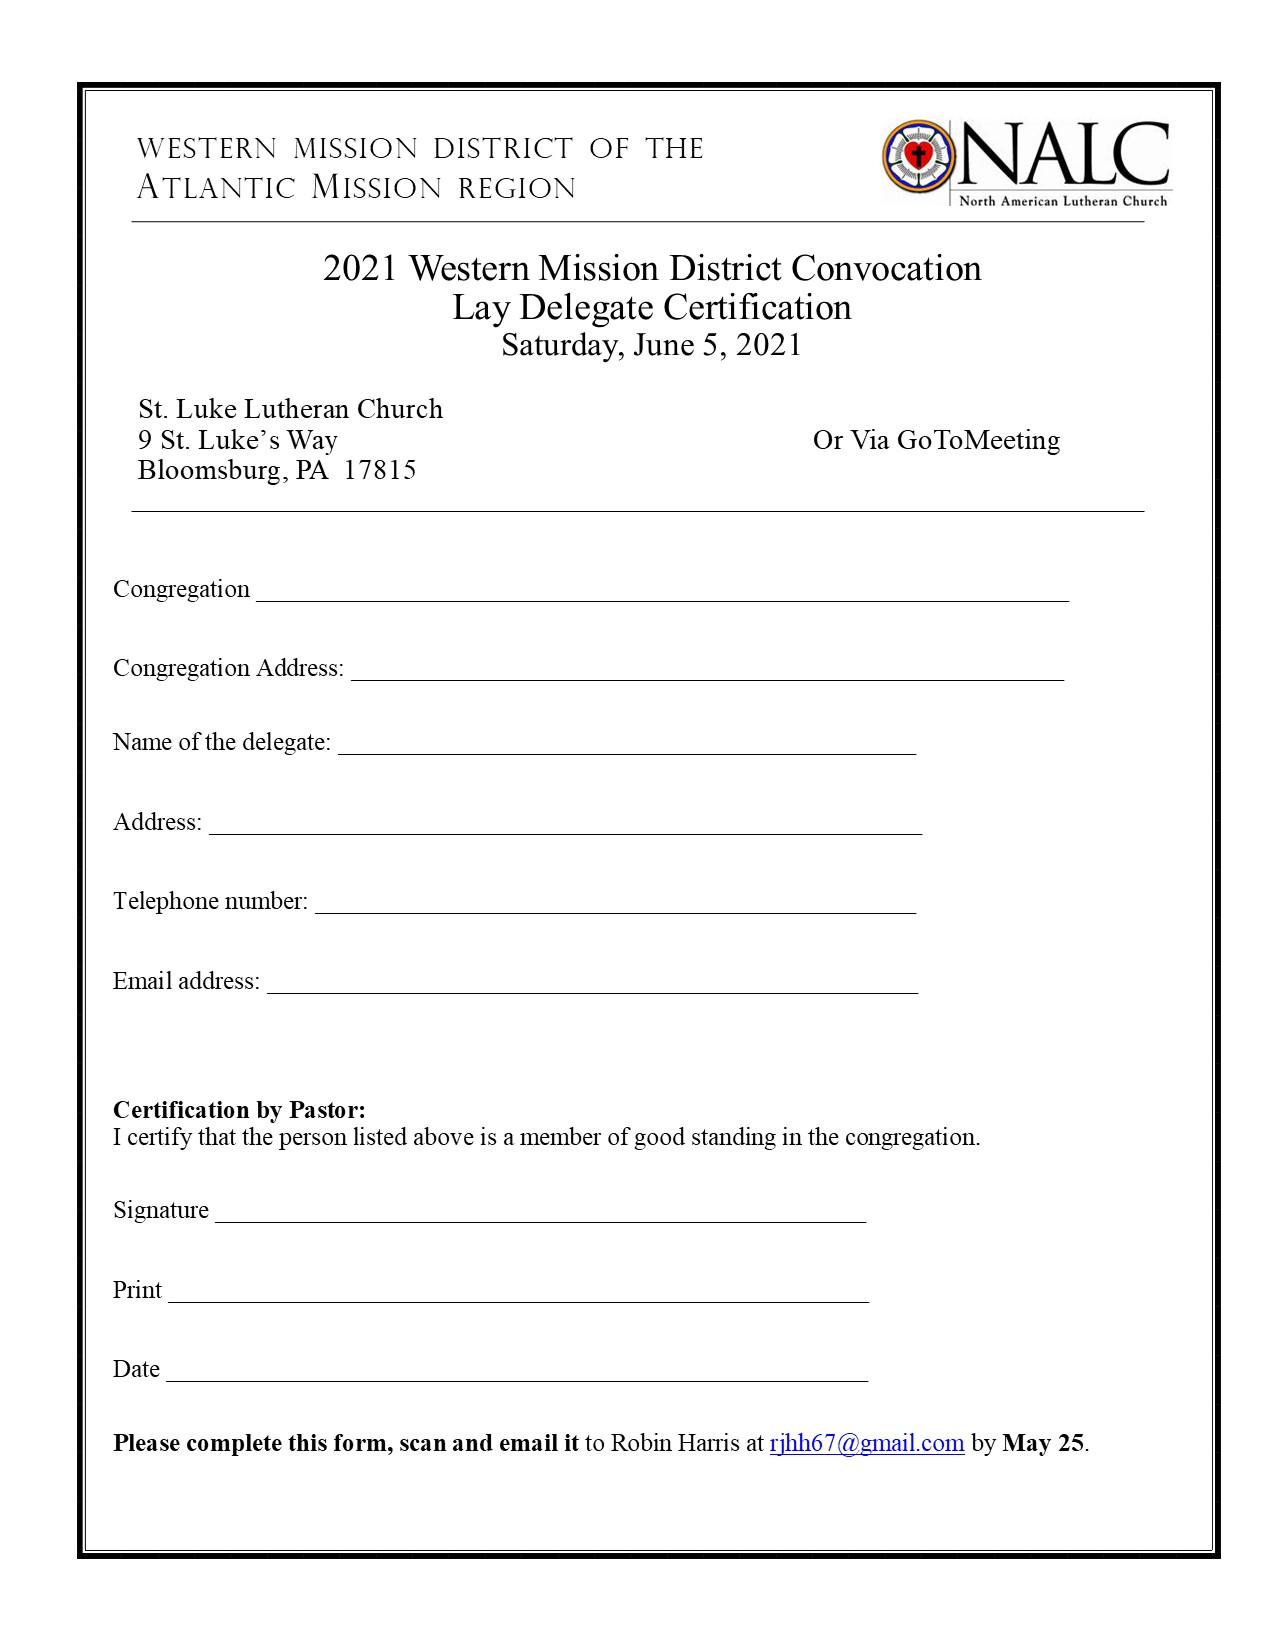 WMD Lay Delegate Certification Form